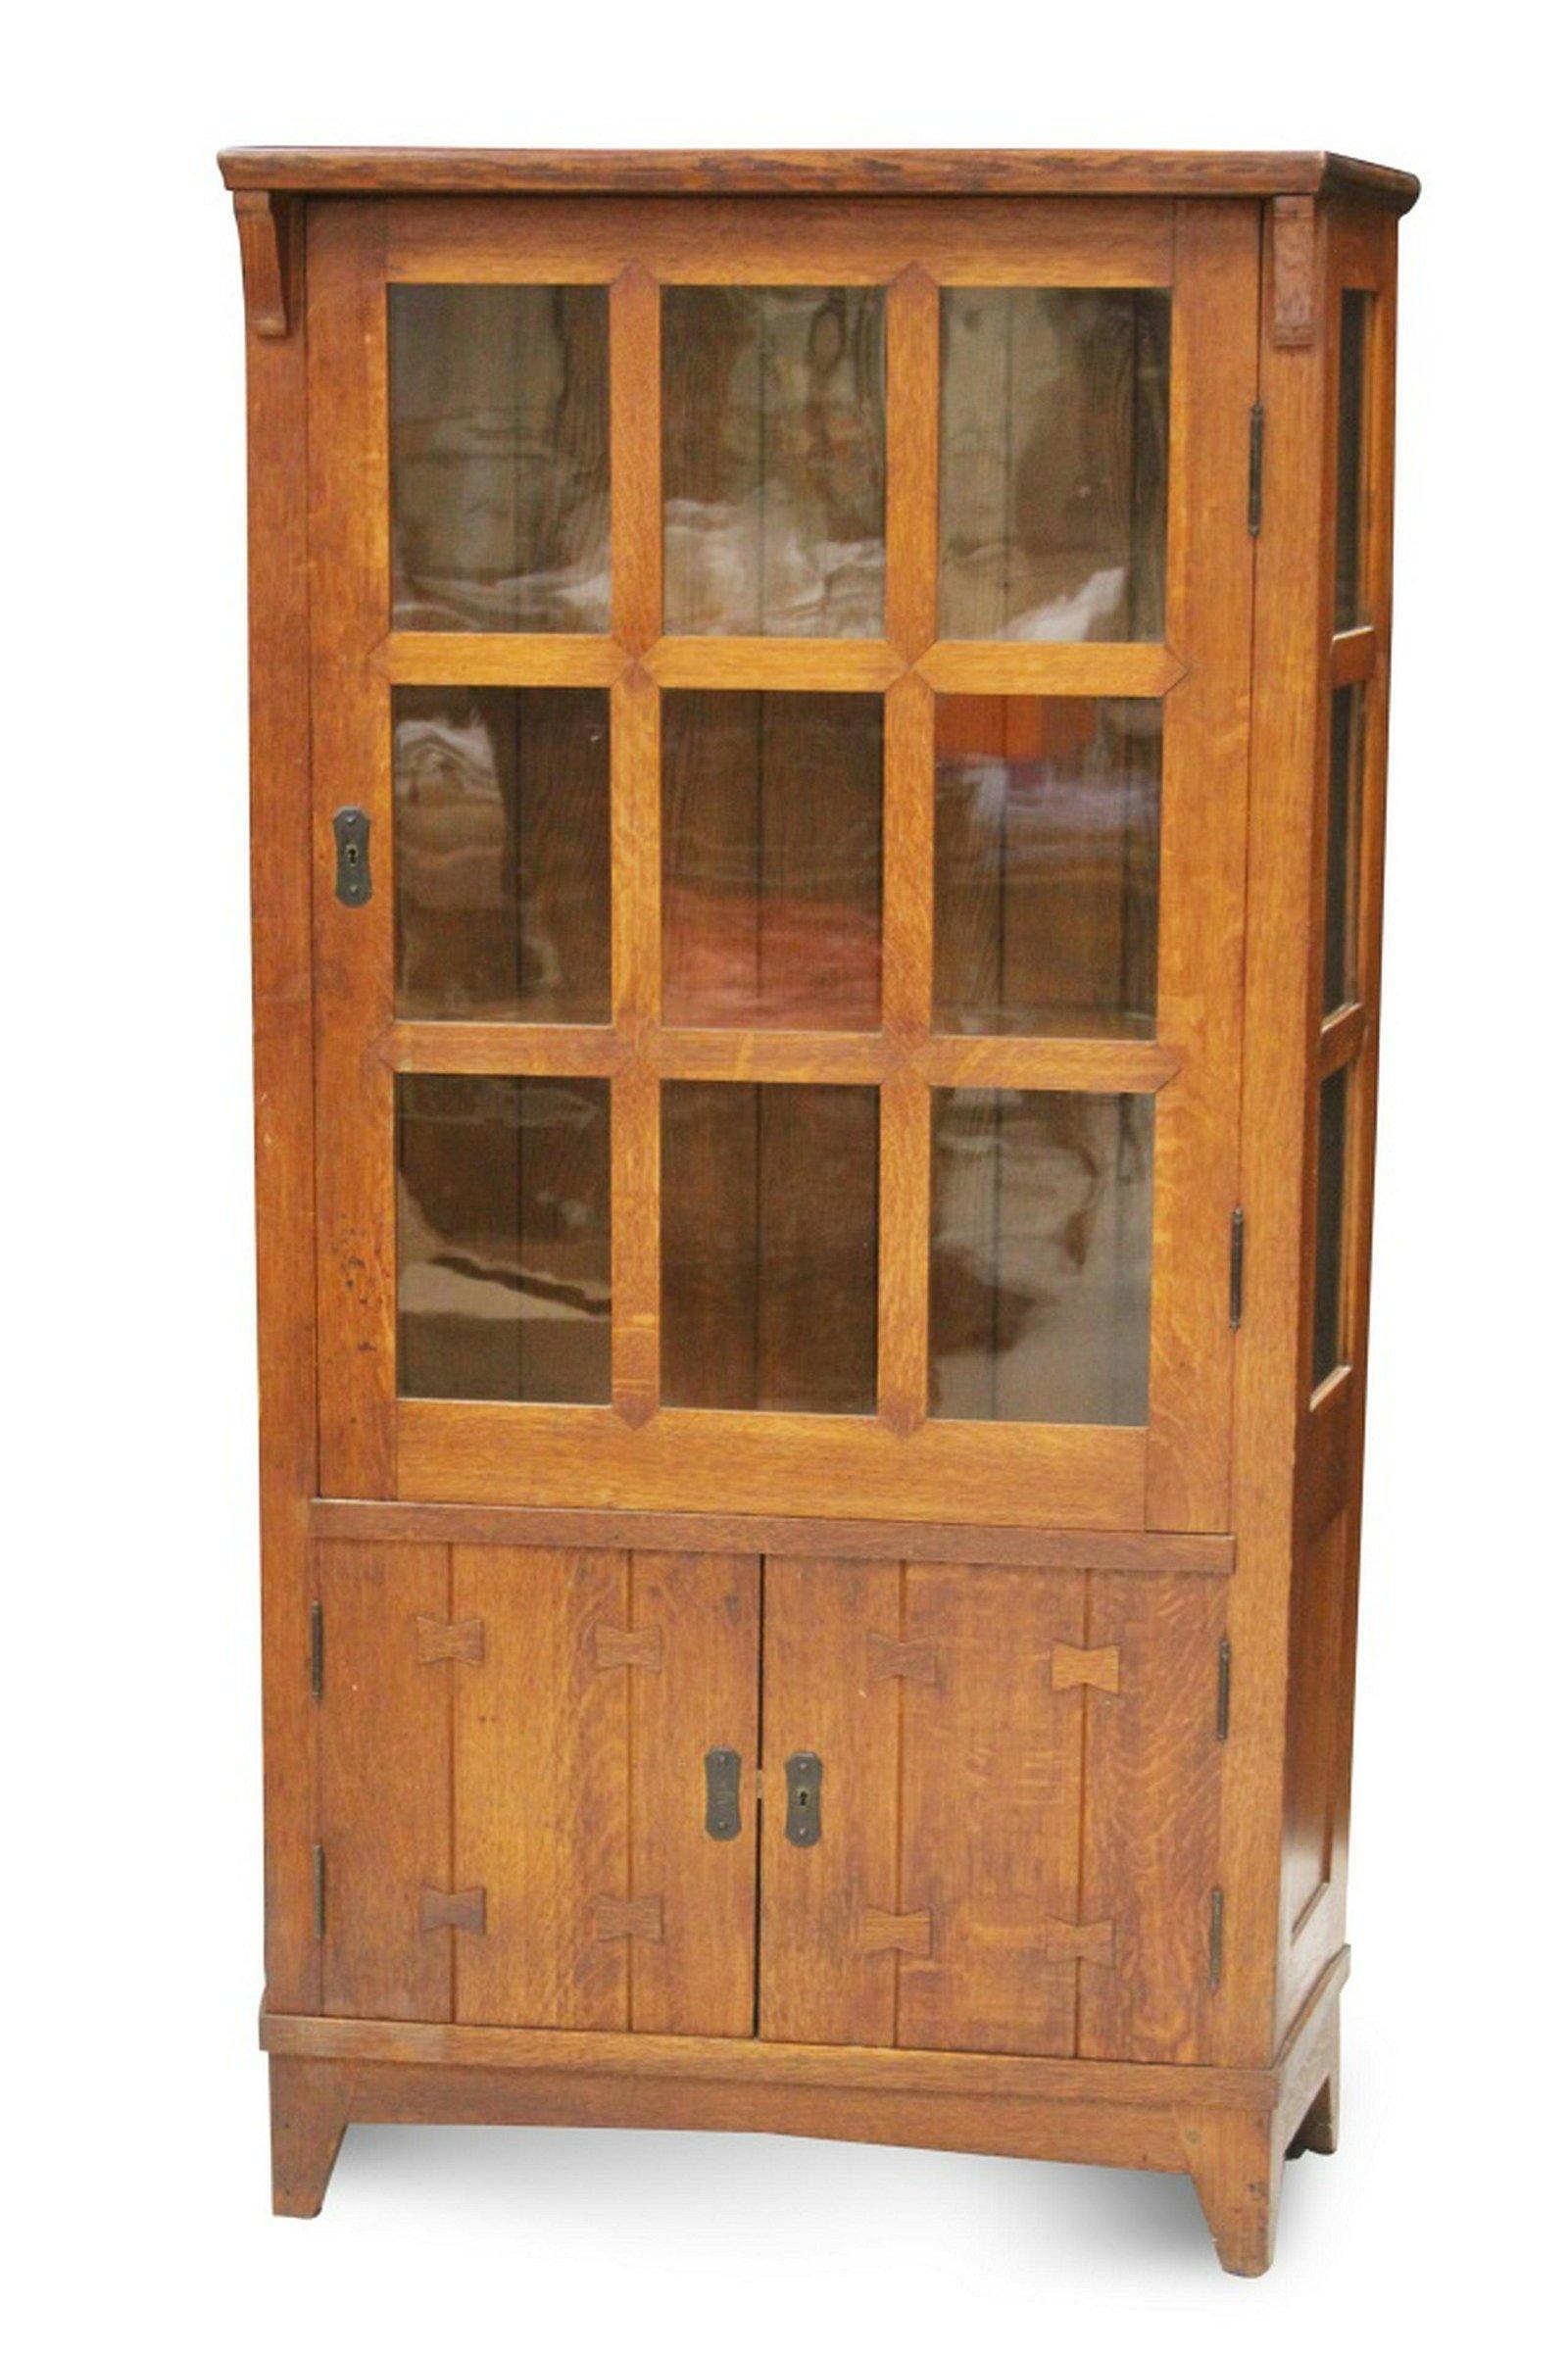 GUSTAV STICKLEY OAK CHINA CABINET, C. 1901 MODEL #902